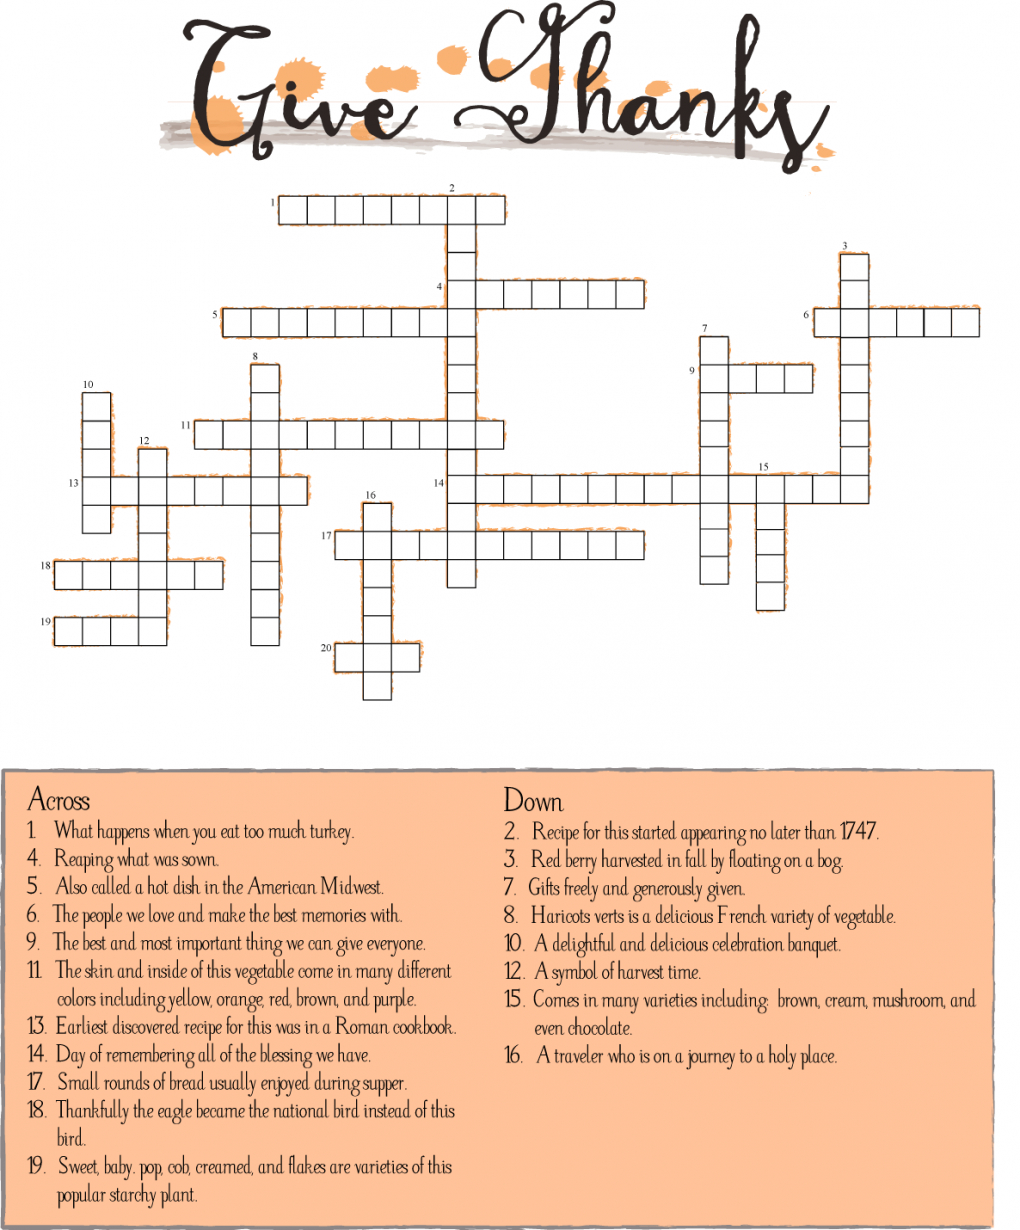 10 Superfun Thanksgiving Crossword Puzzles | Kittybabylove - Printable Thanksgiving Crossword